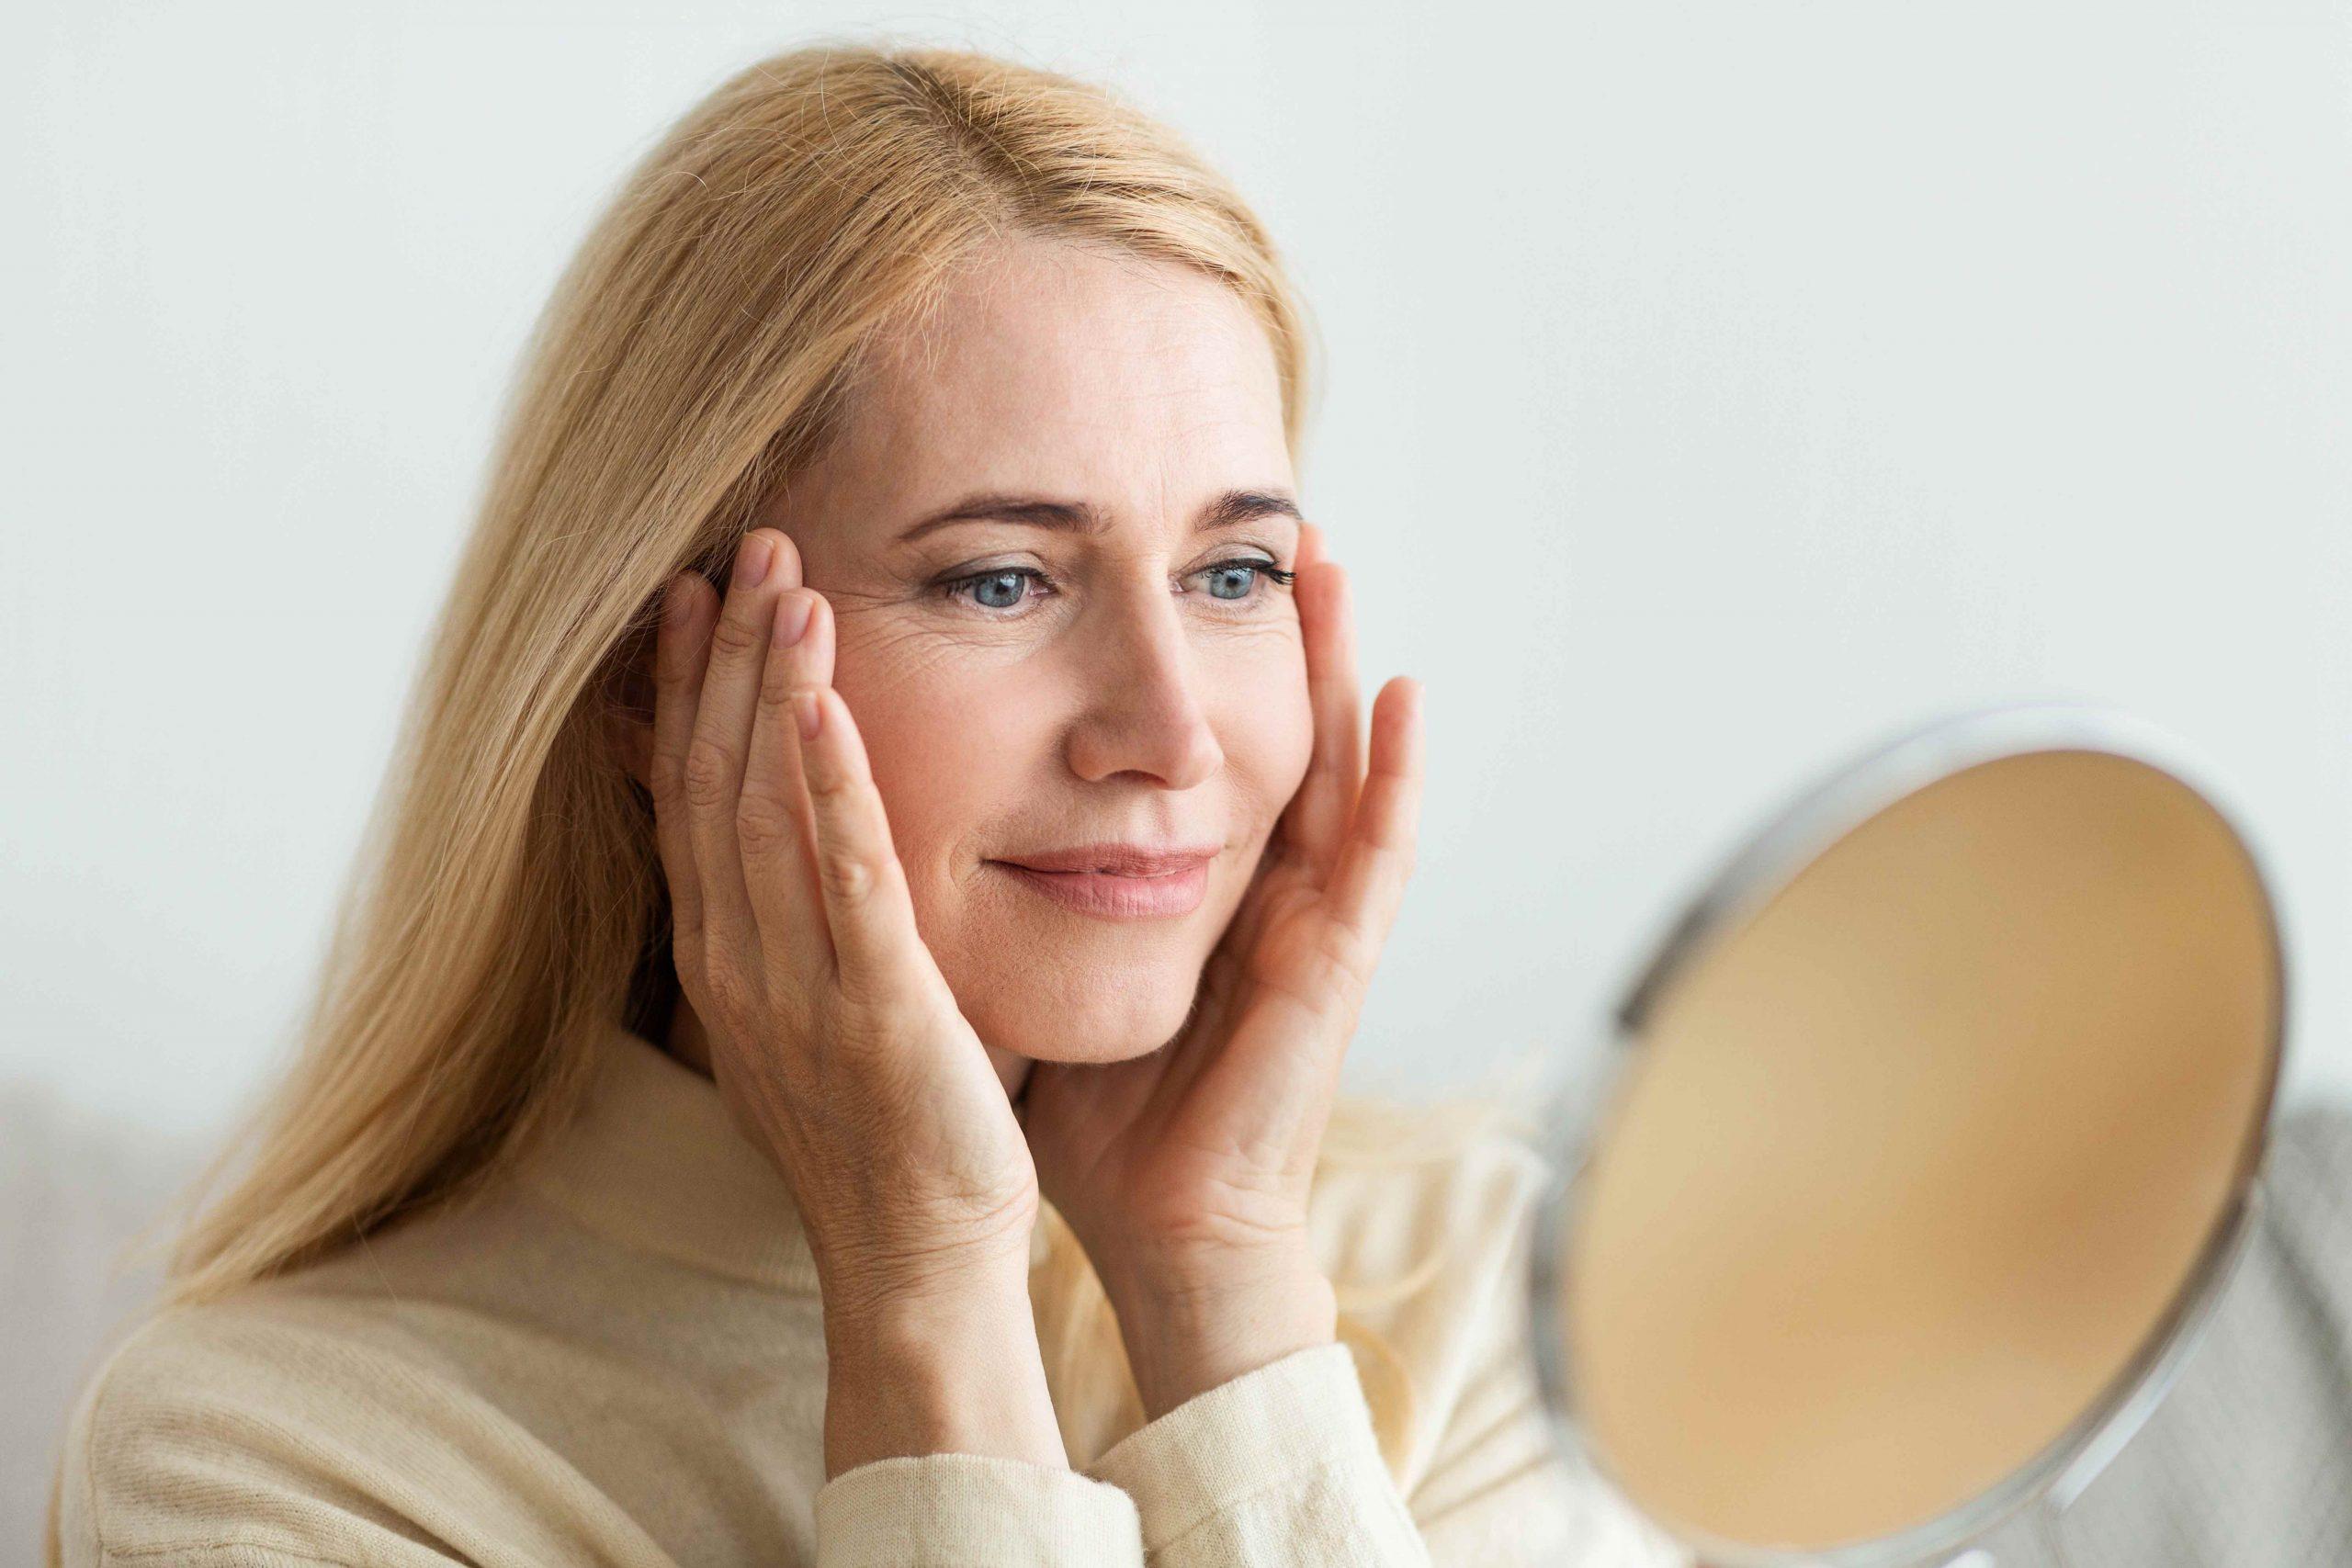 benefits of laser skin technology